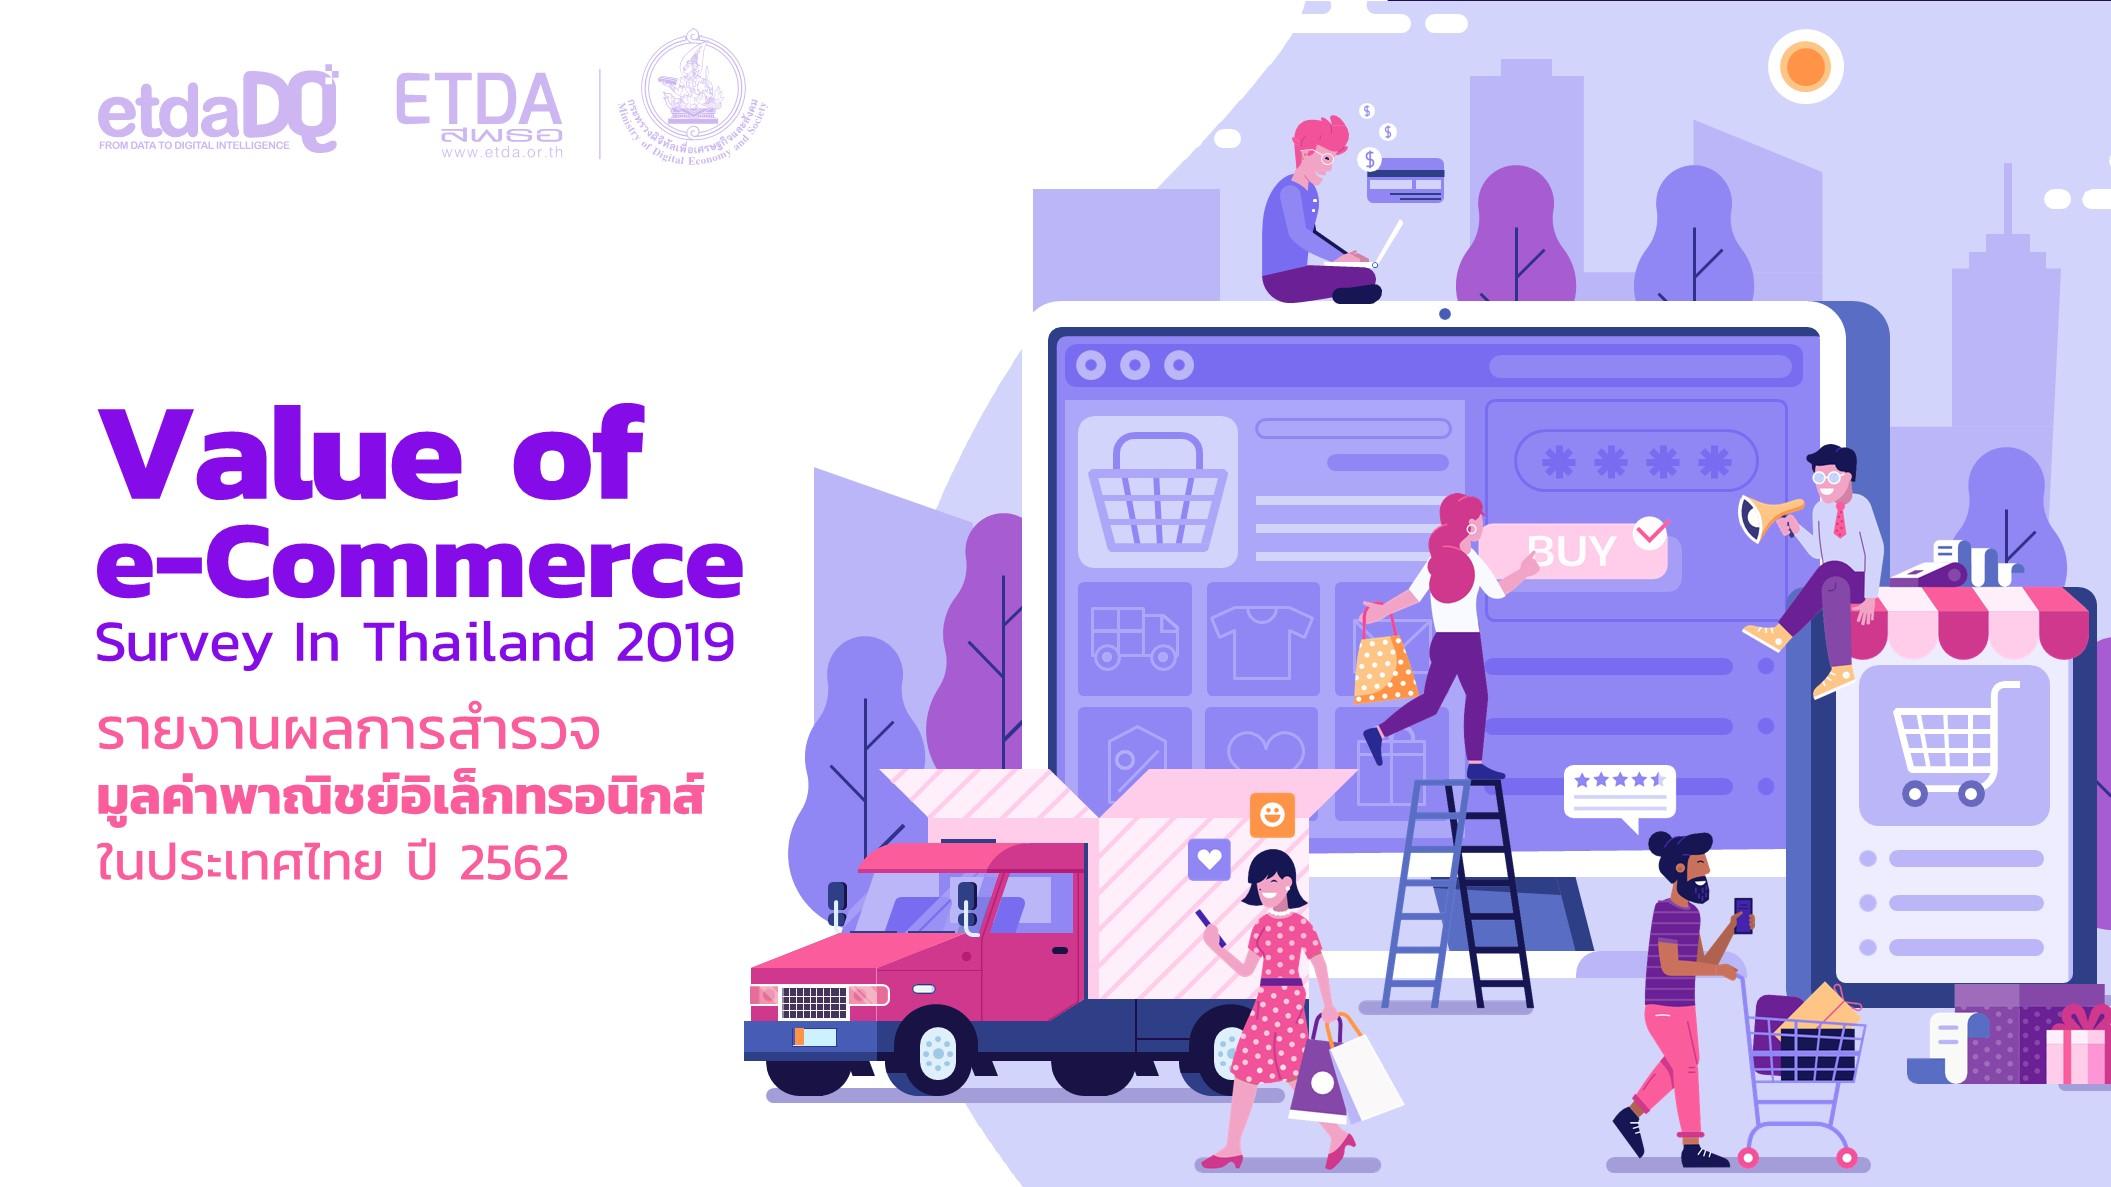 ETDA เผยมูลค่า e-Commerce ไทย ปี 62 คาดพุ่ง 4.02 ล้านล้านบาท